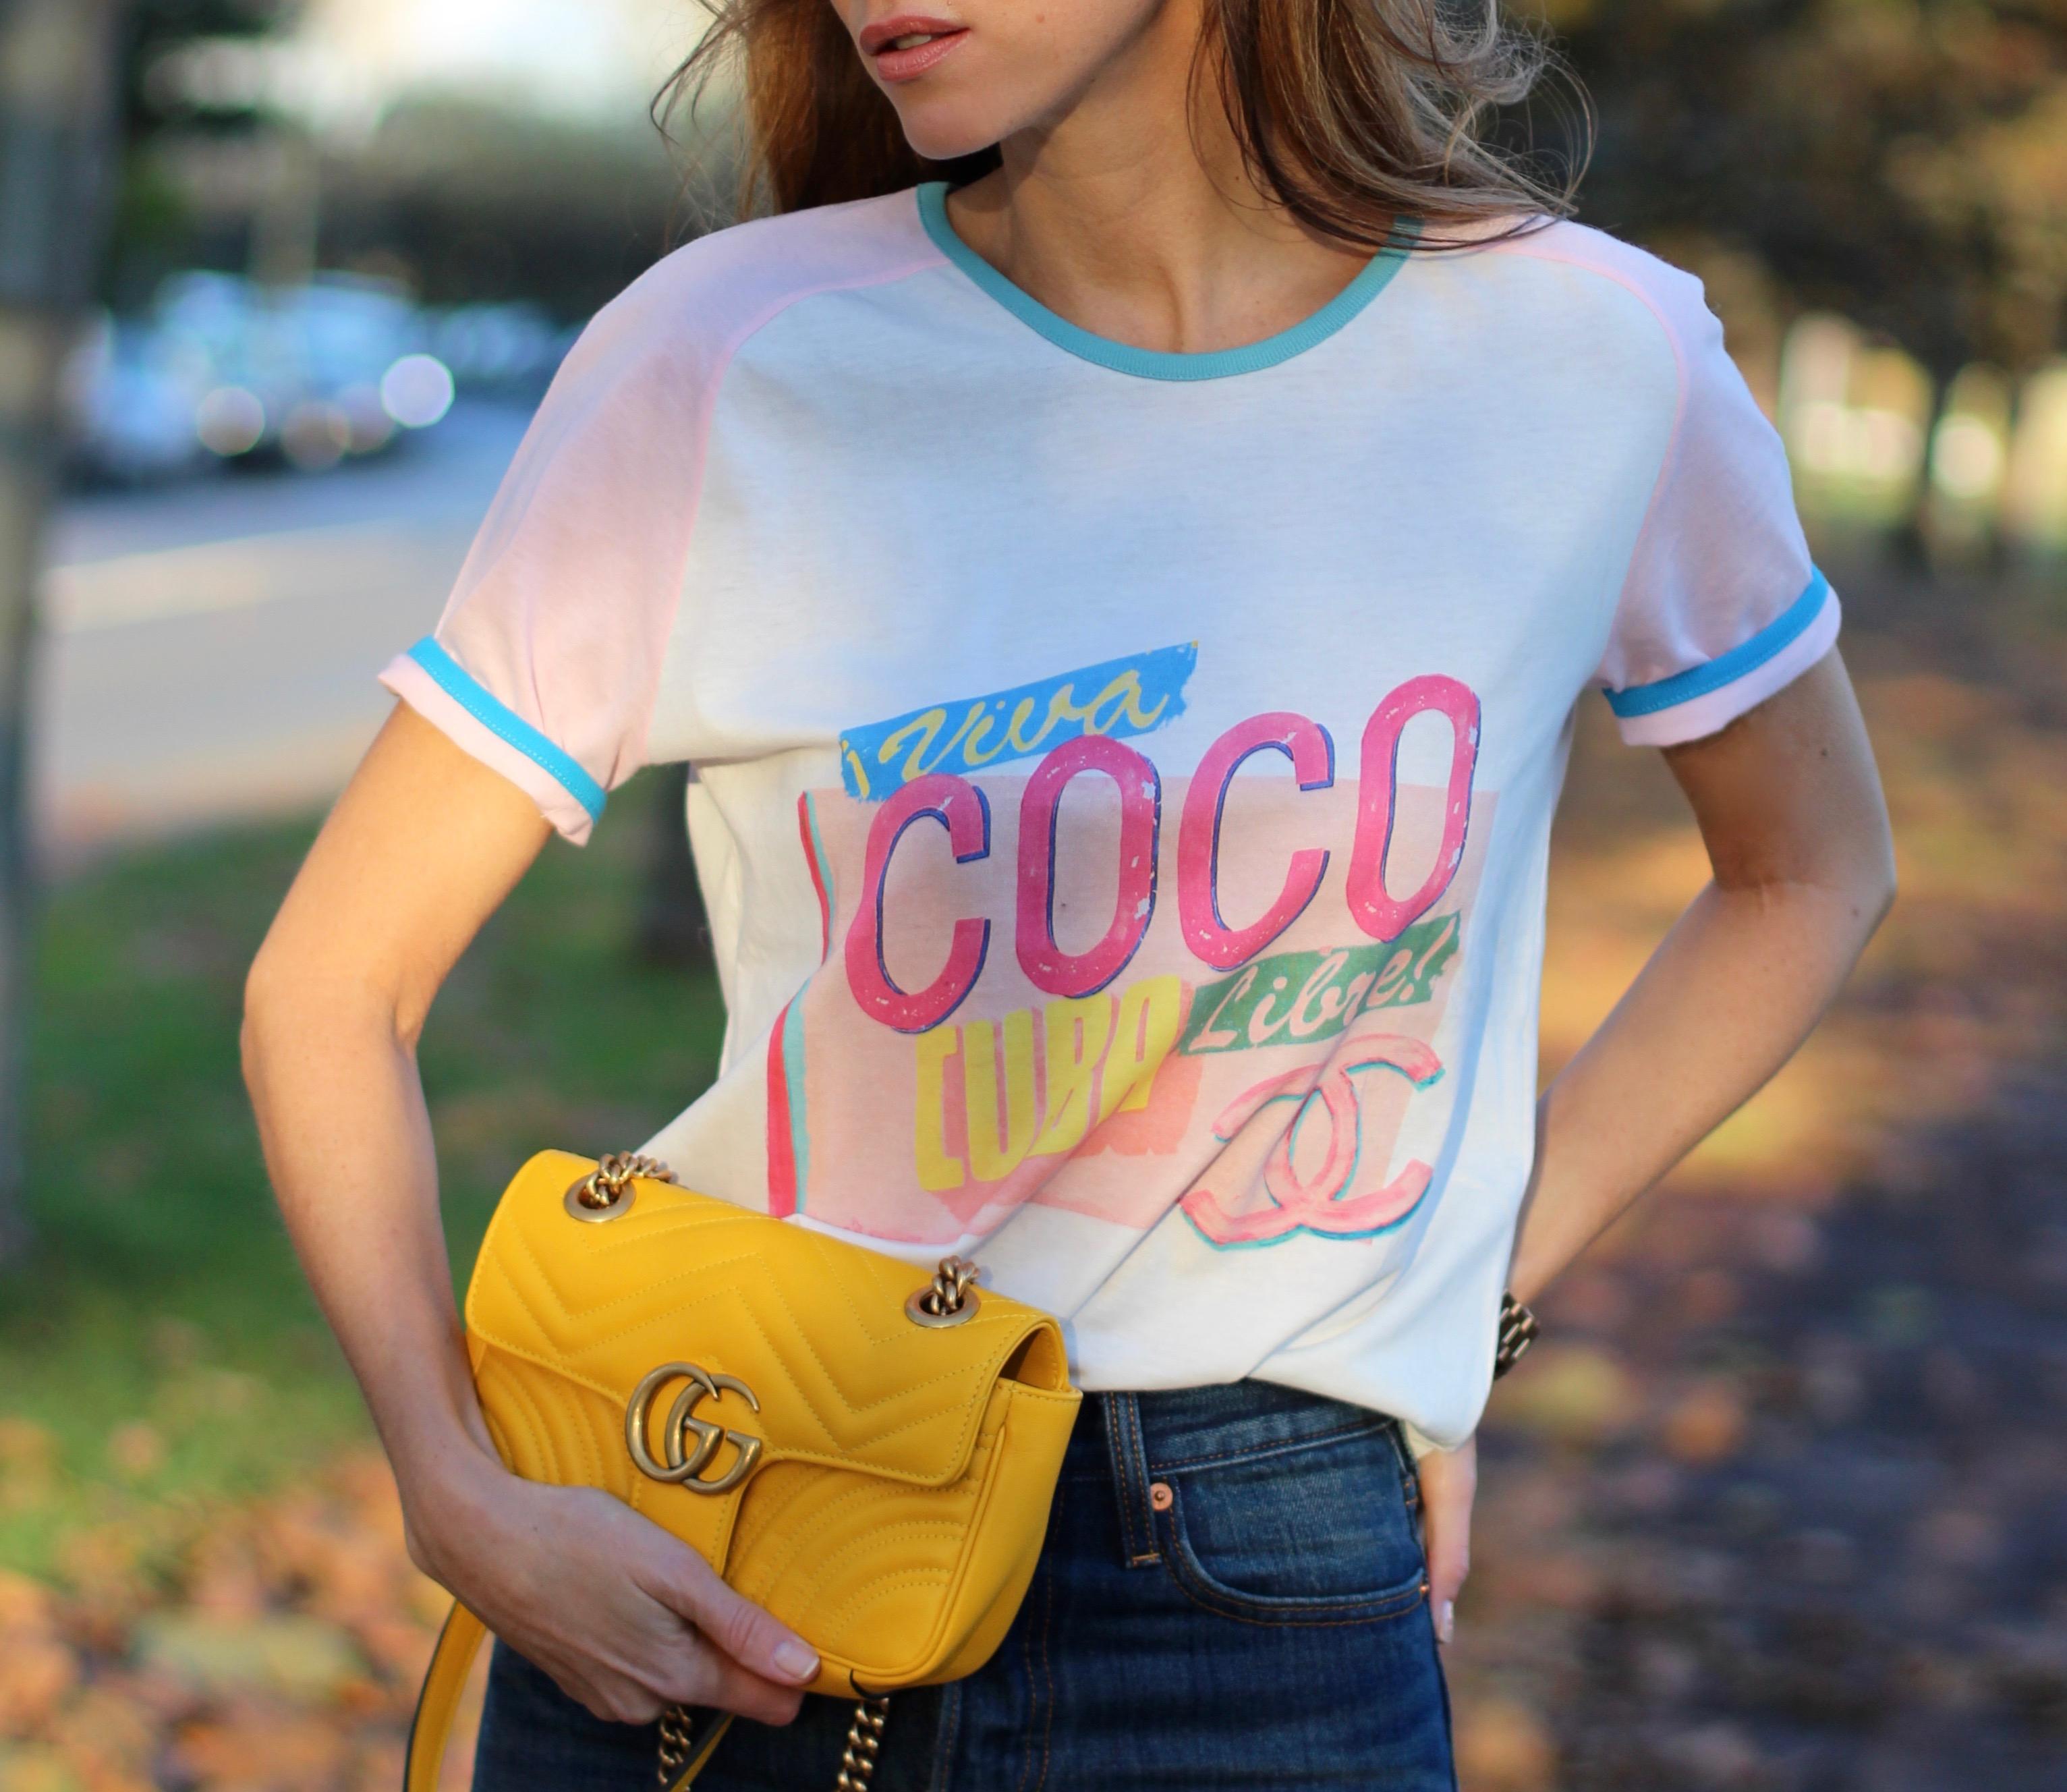 Coco Cuba Blog Alexandra Lapp